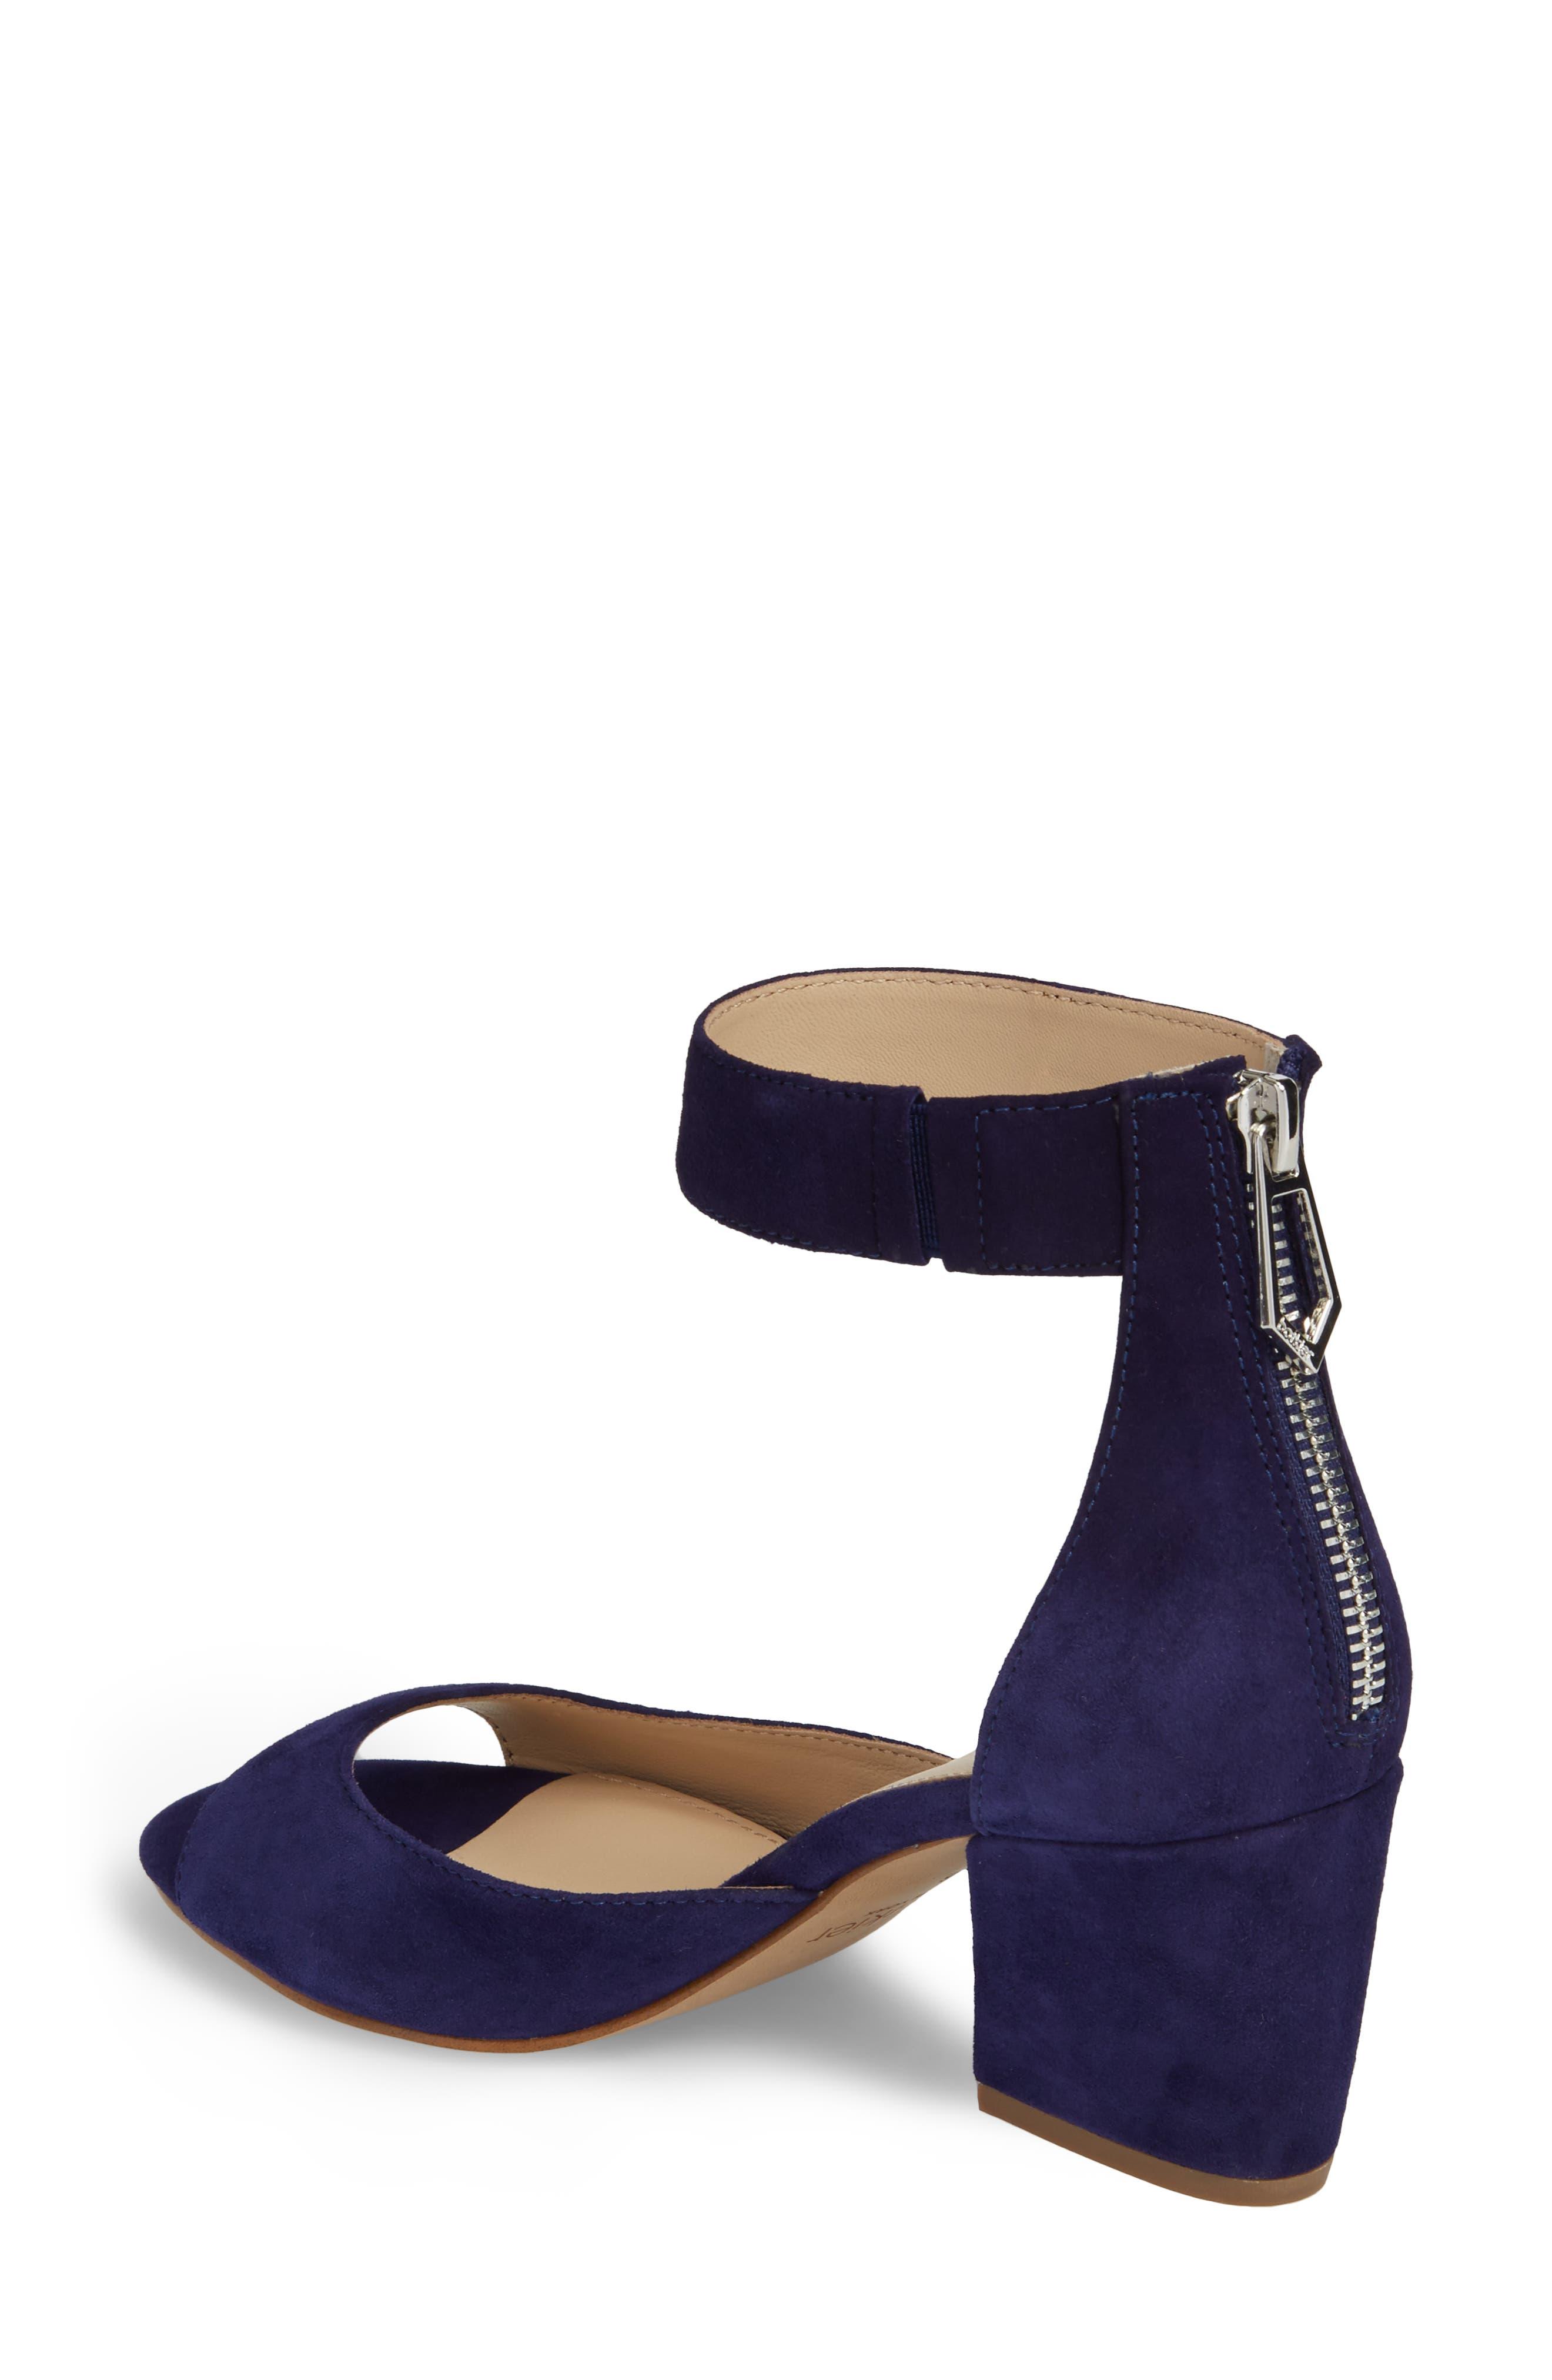 Pilar Ankle Strap Sandal,                             Alternate thumbnail 2, color,                             403